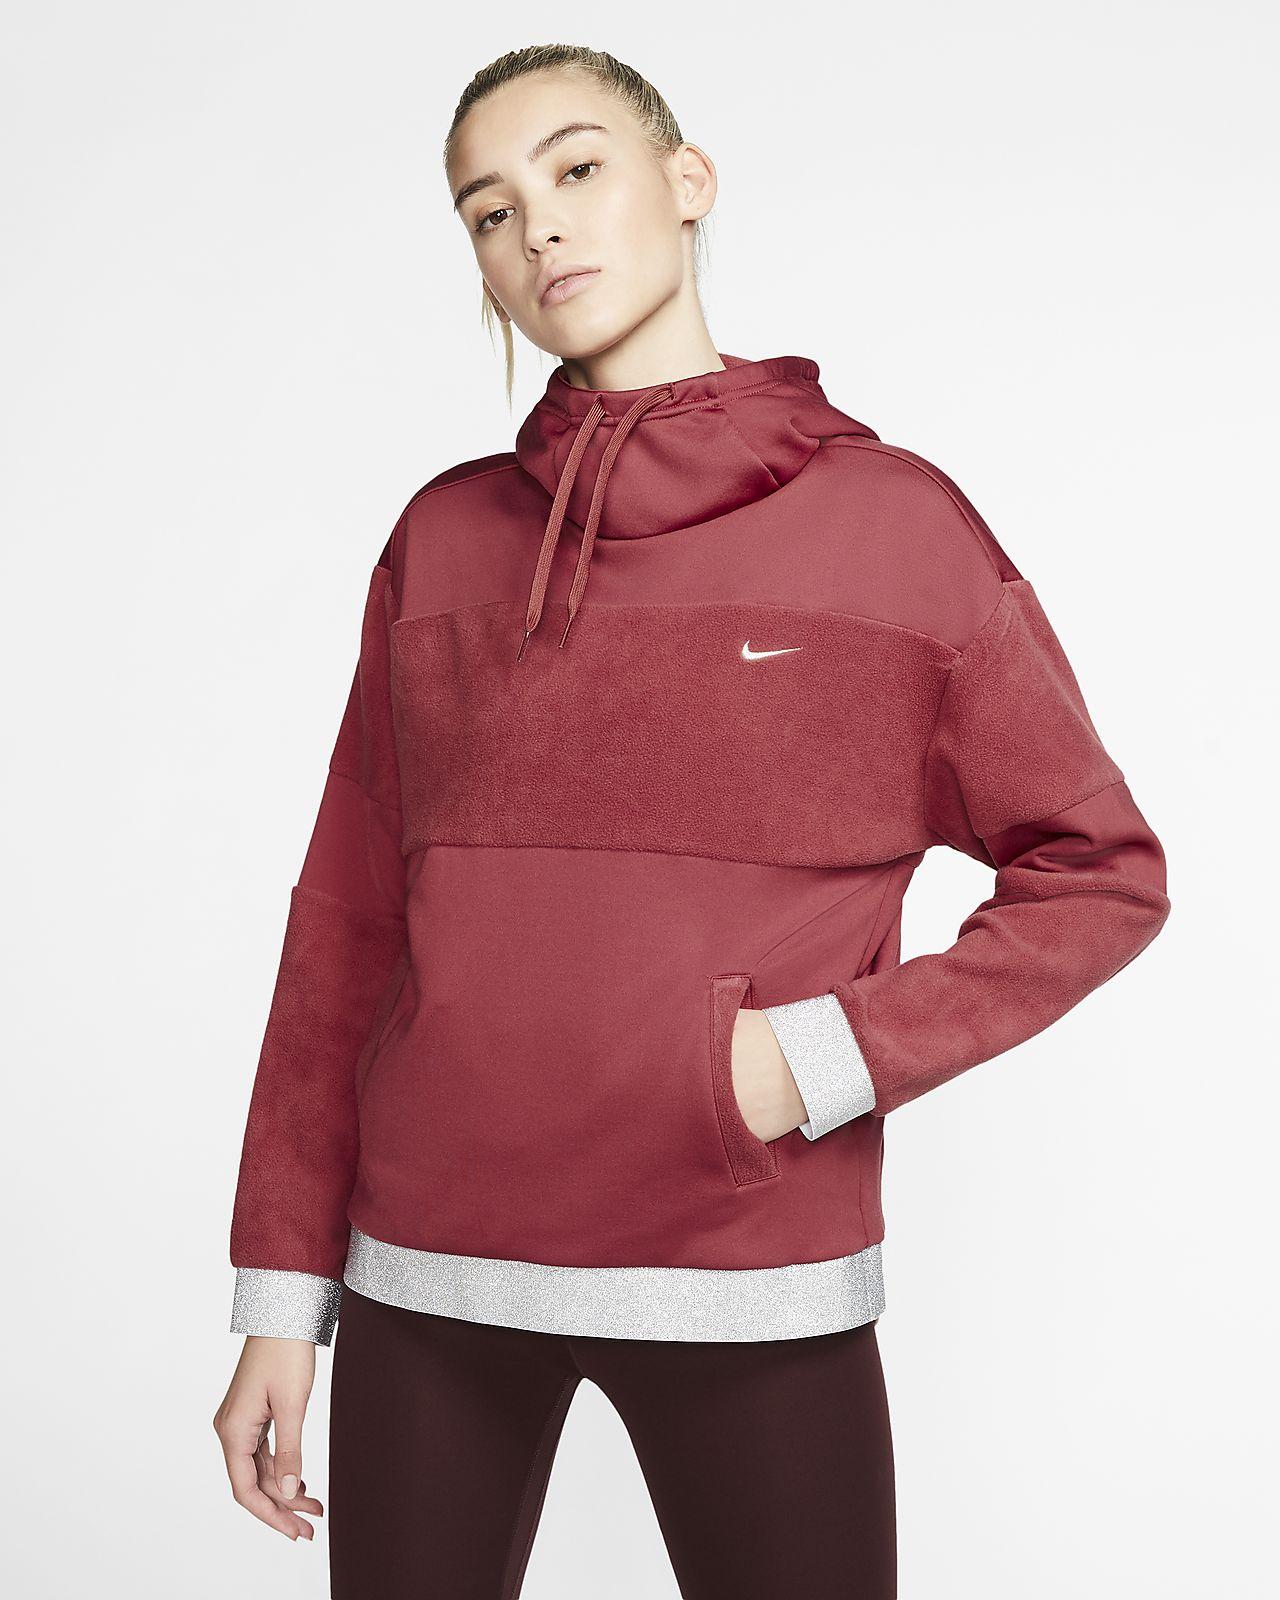 Nike Icon Clash Trainingshoodie van fleece voor dames